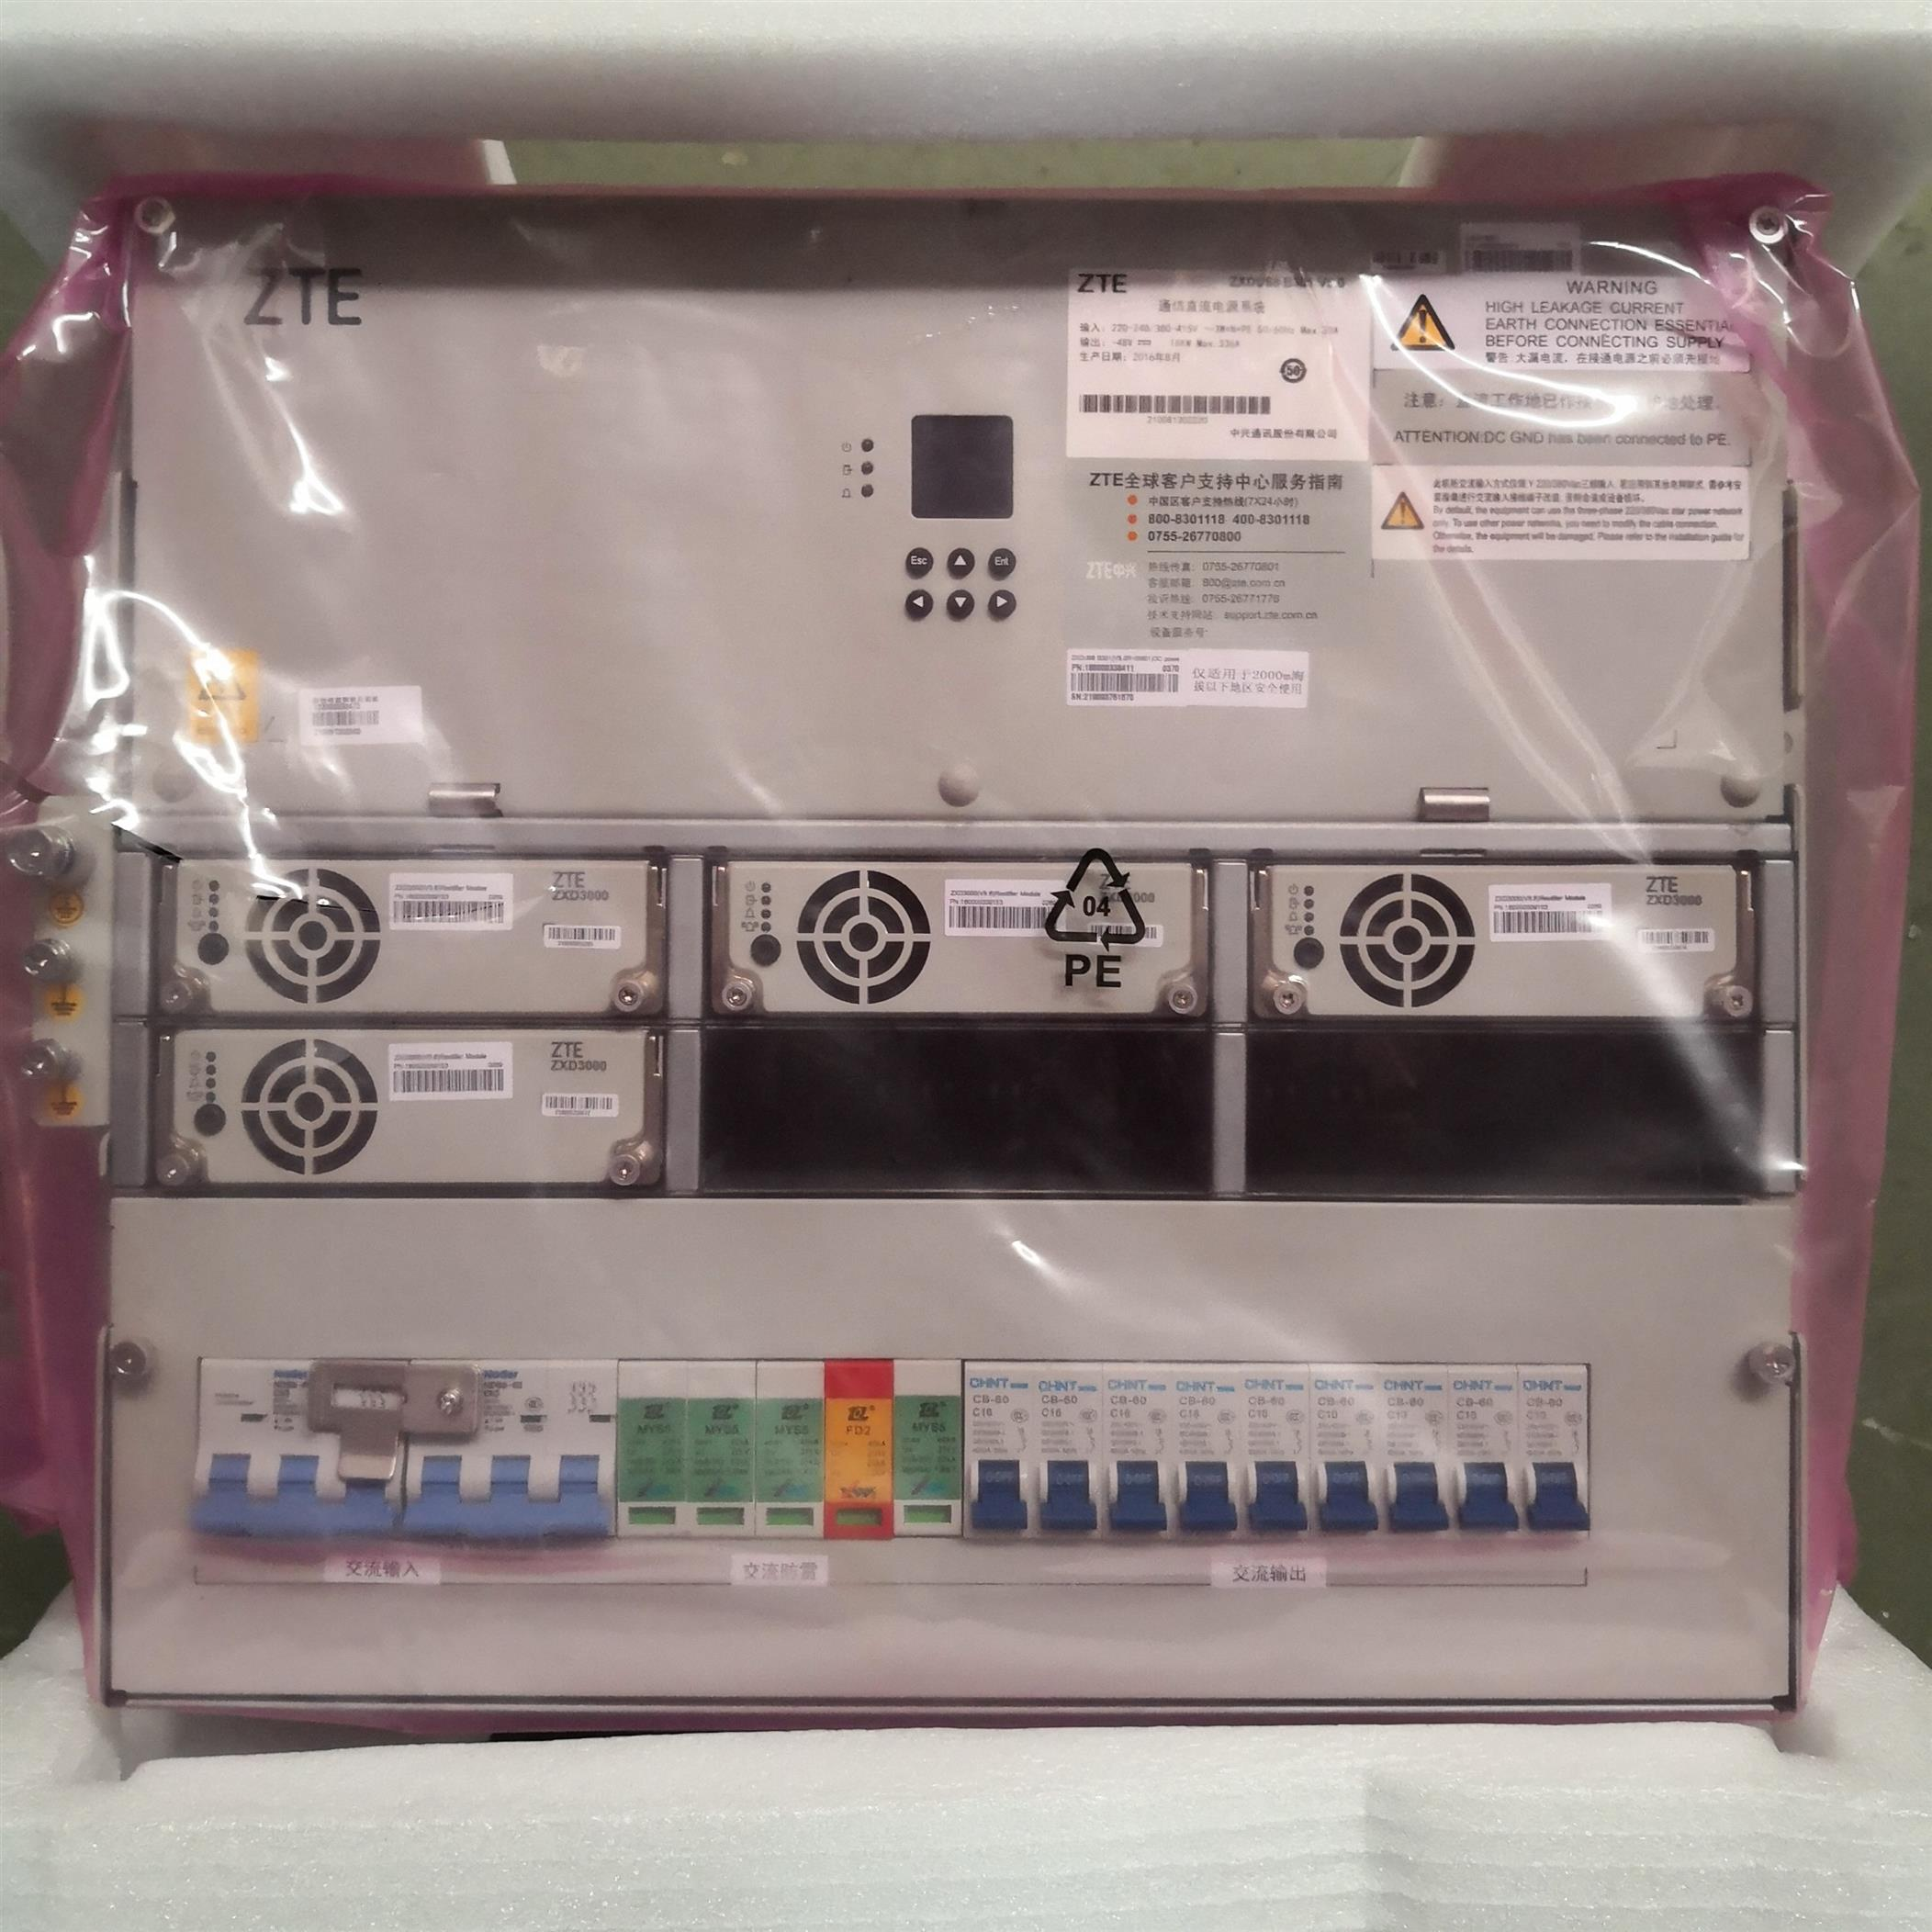 ZXDU58B900嵌入式電源